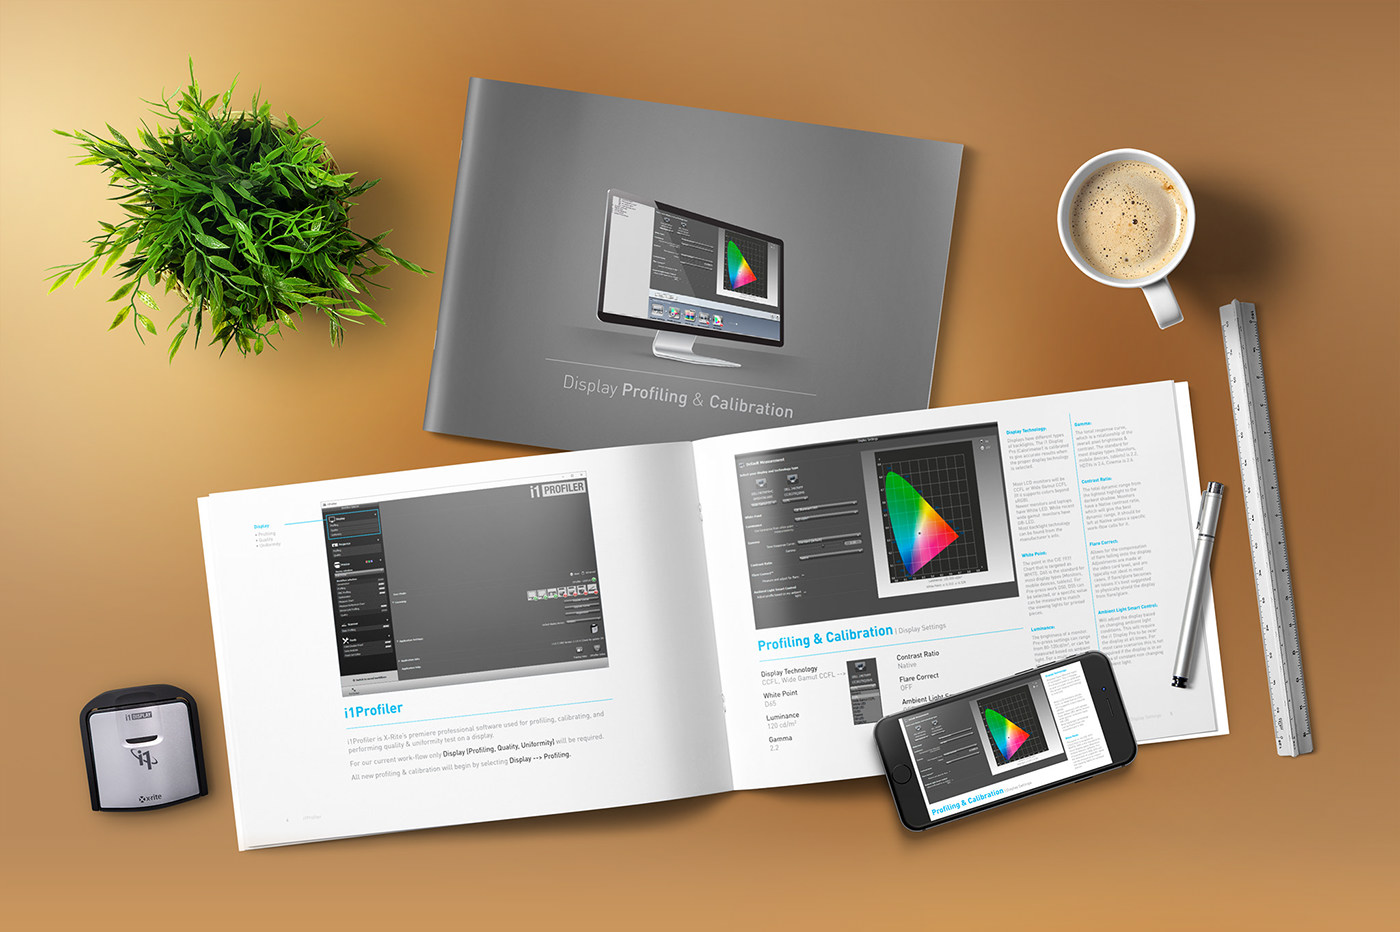 color management Display profiling calibration manual i1DisplayPro calorimeter xrite